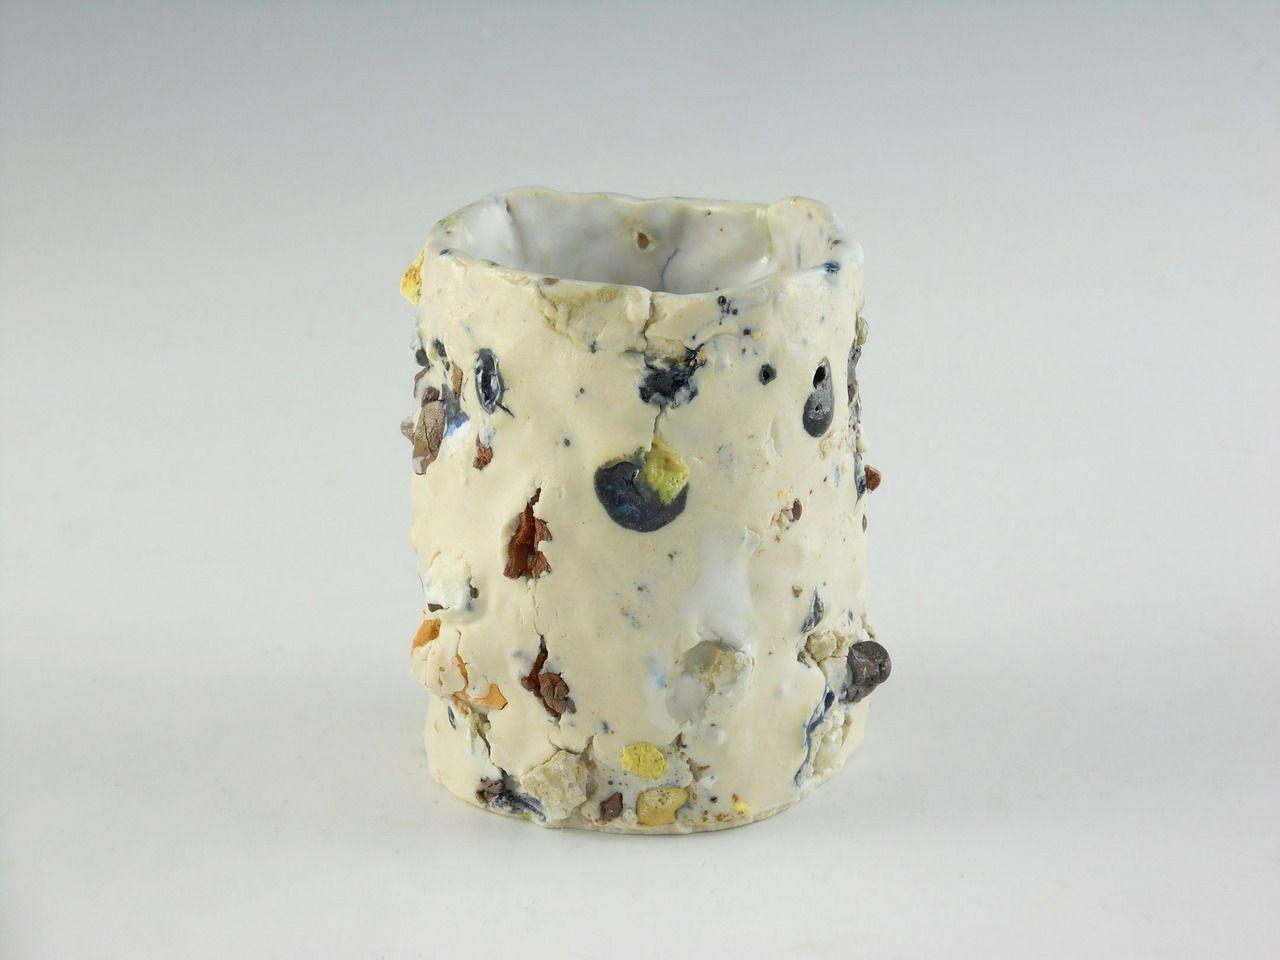 Nicecupbro Joanna Pike Contemporary Ceramics Ceramic Animals Ceramic Shop